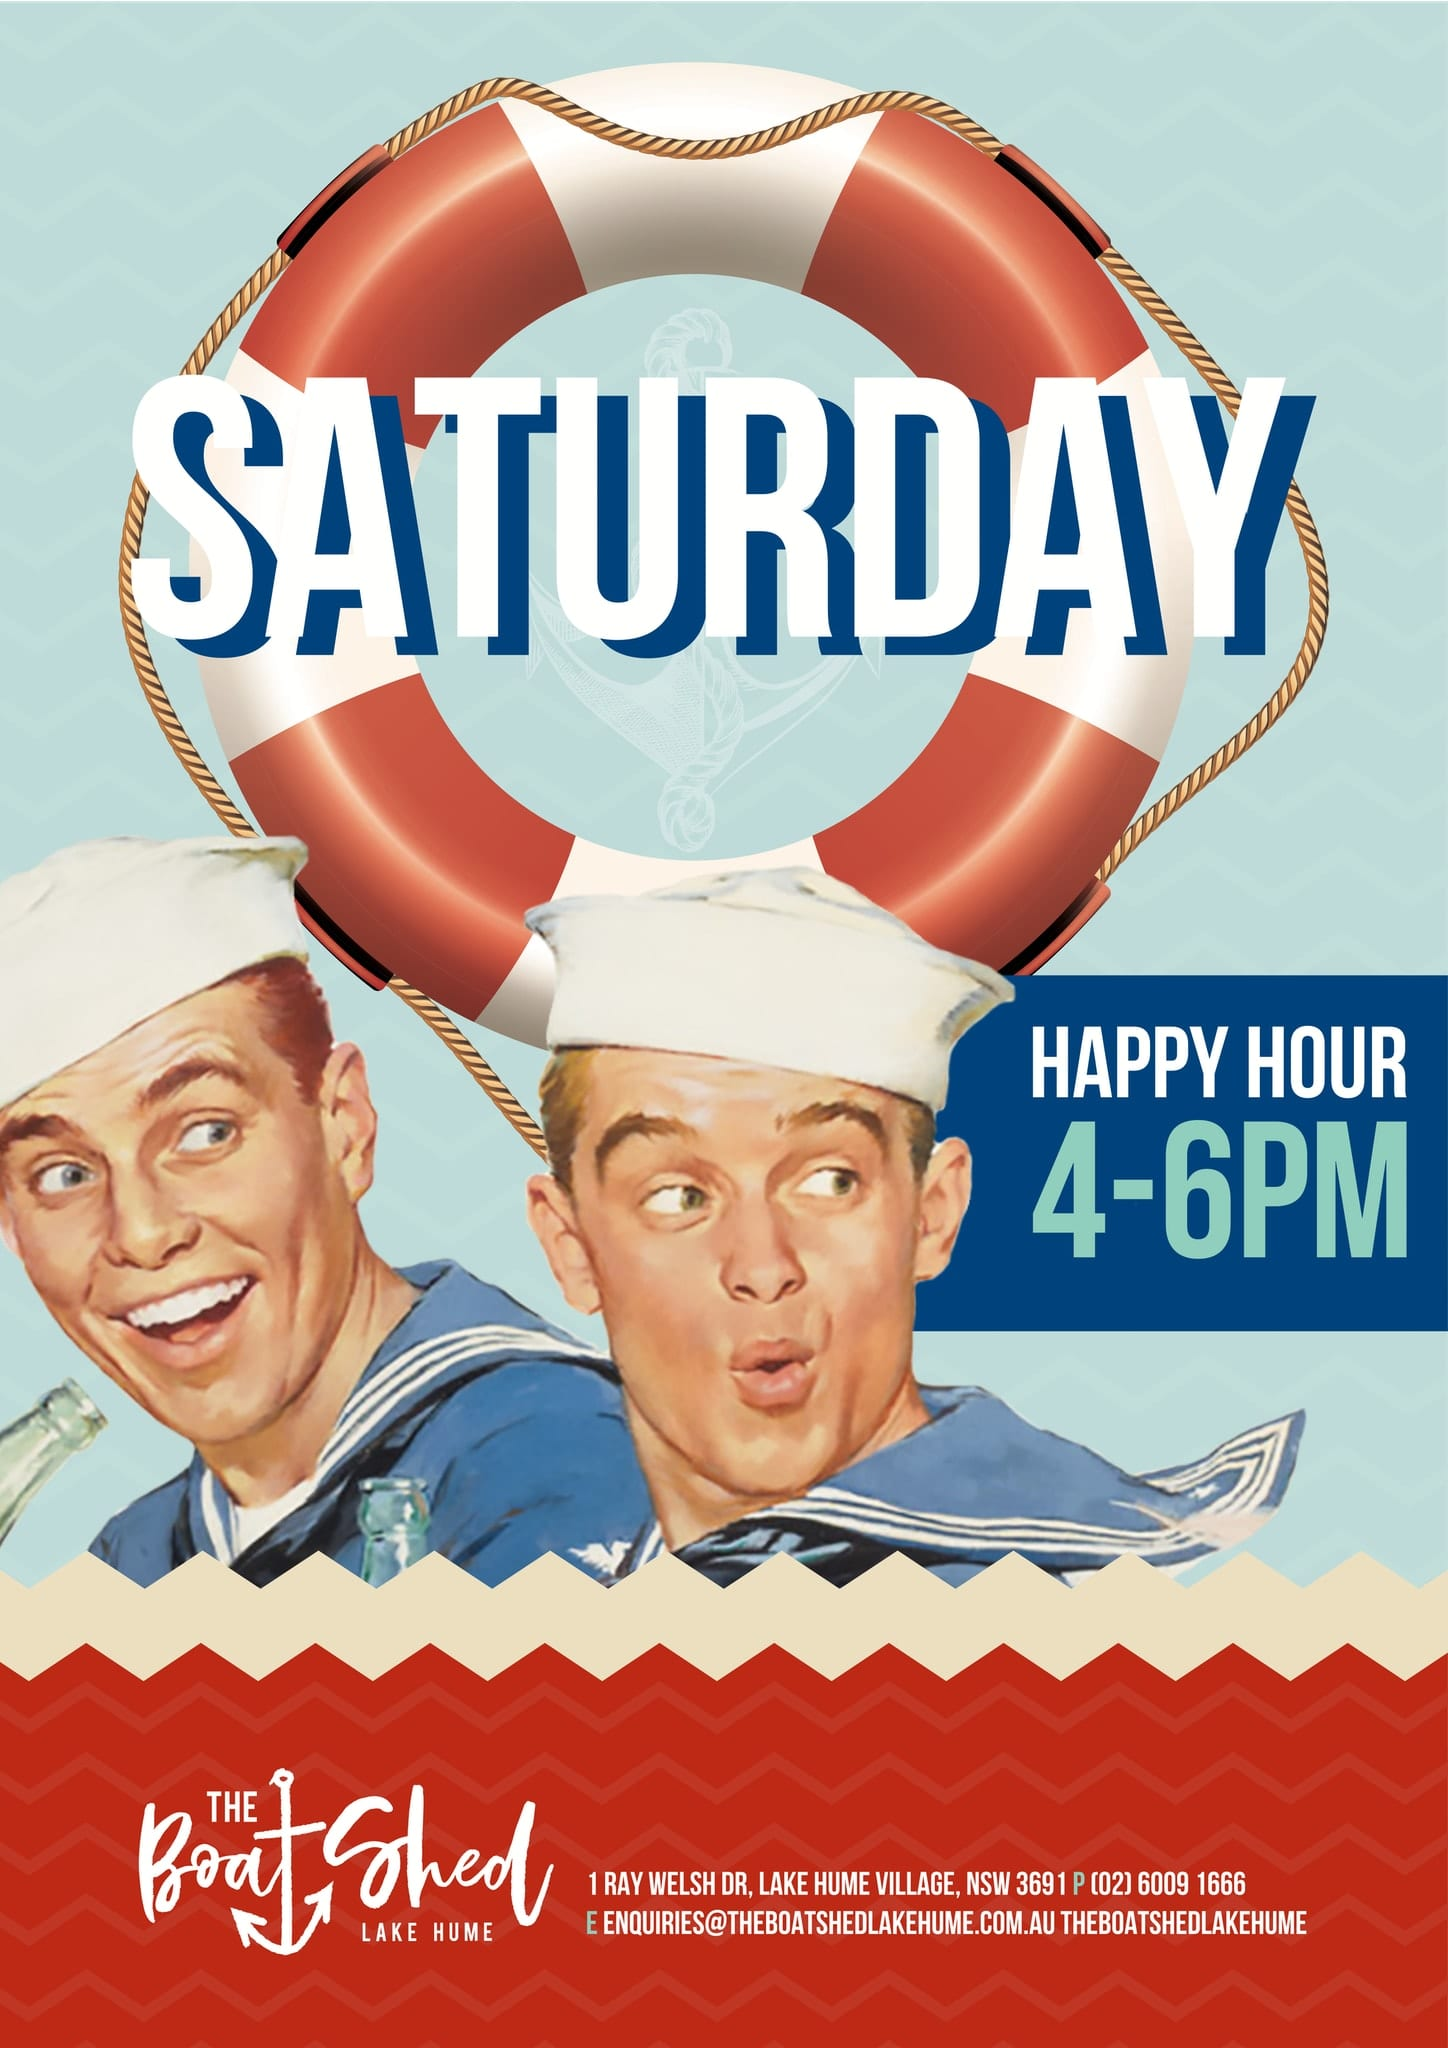 Saturday Happy Hour